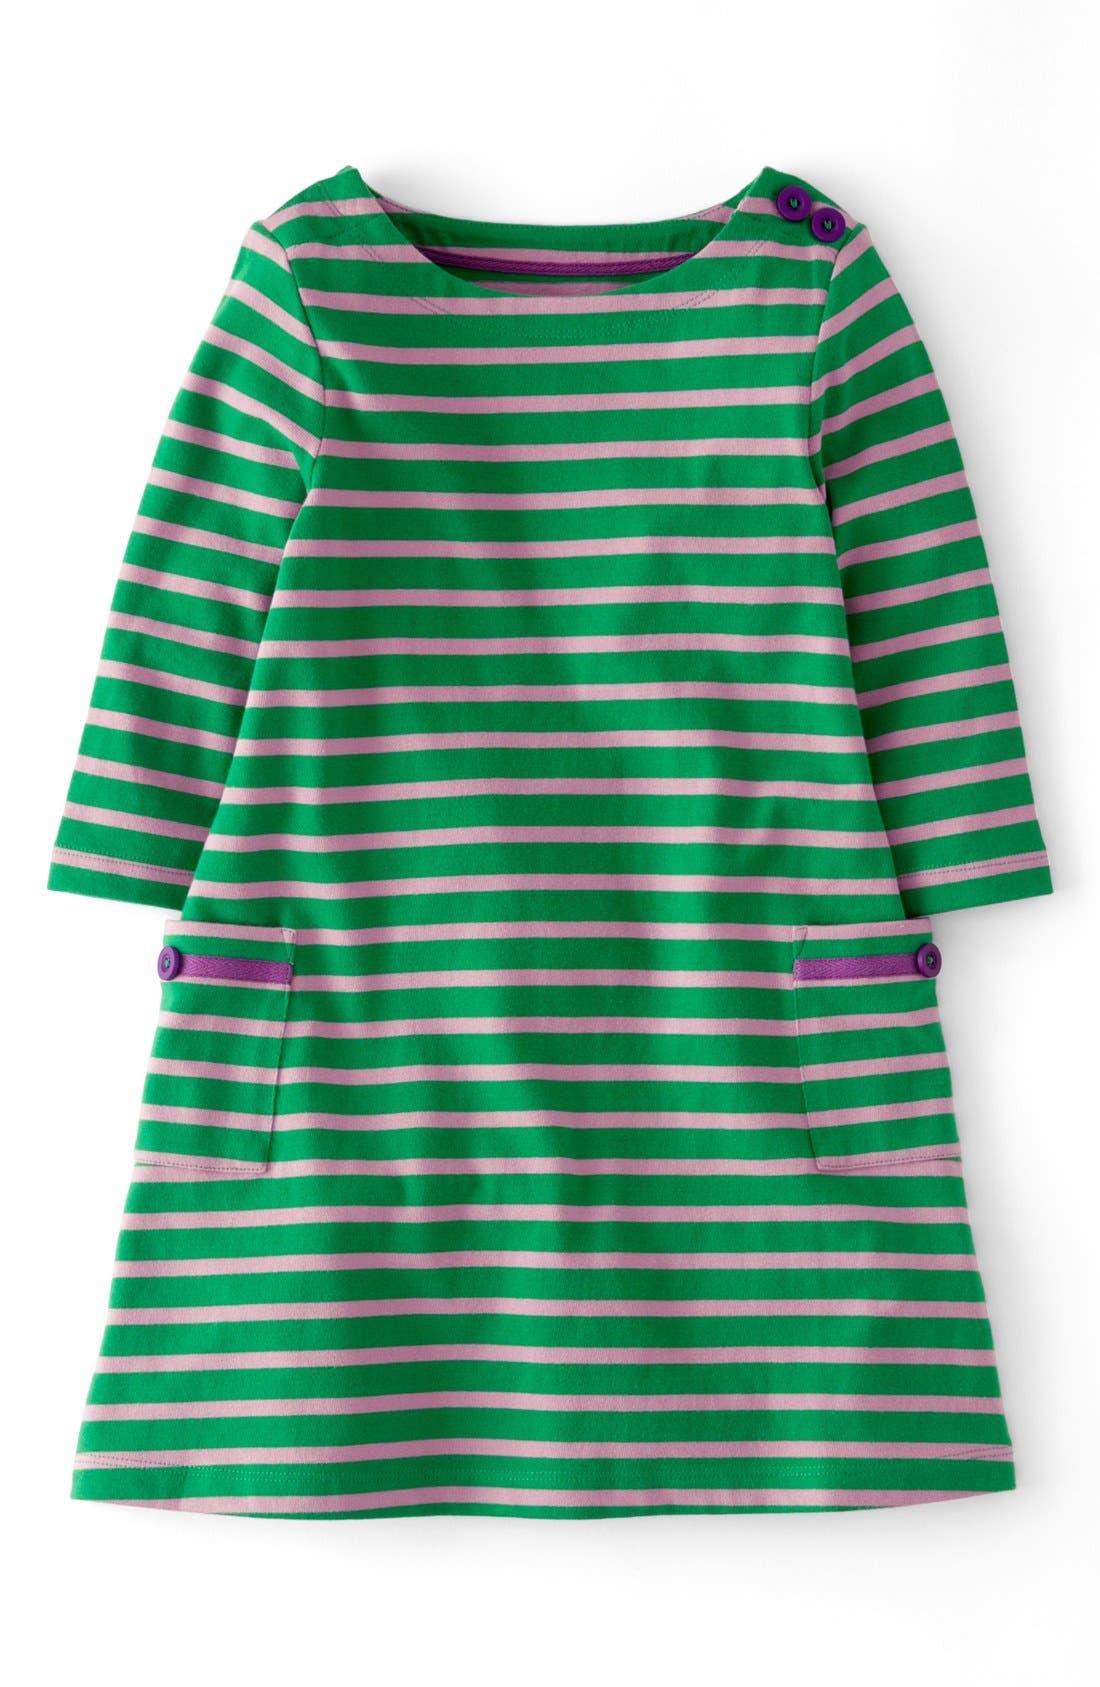 Alternate Image 1 Selected - Mini Boden Stripy Boatneck Dress (Toddler Girls, Little Girls & Big Girls)(Online Only)